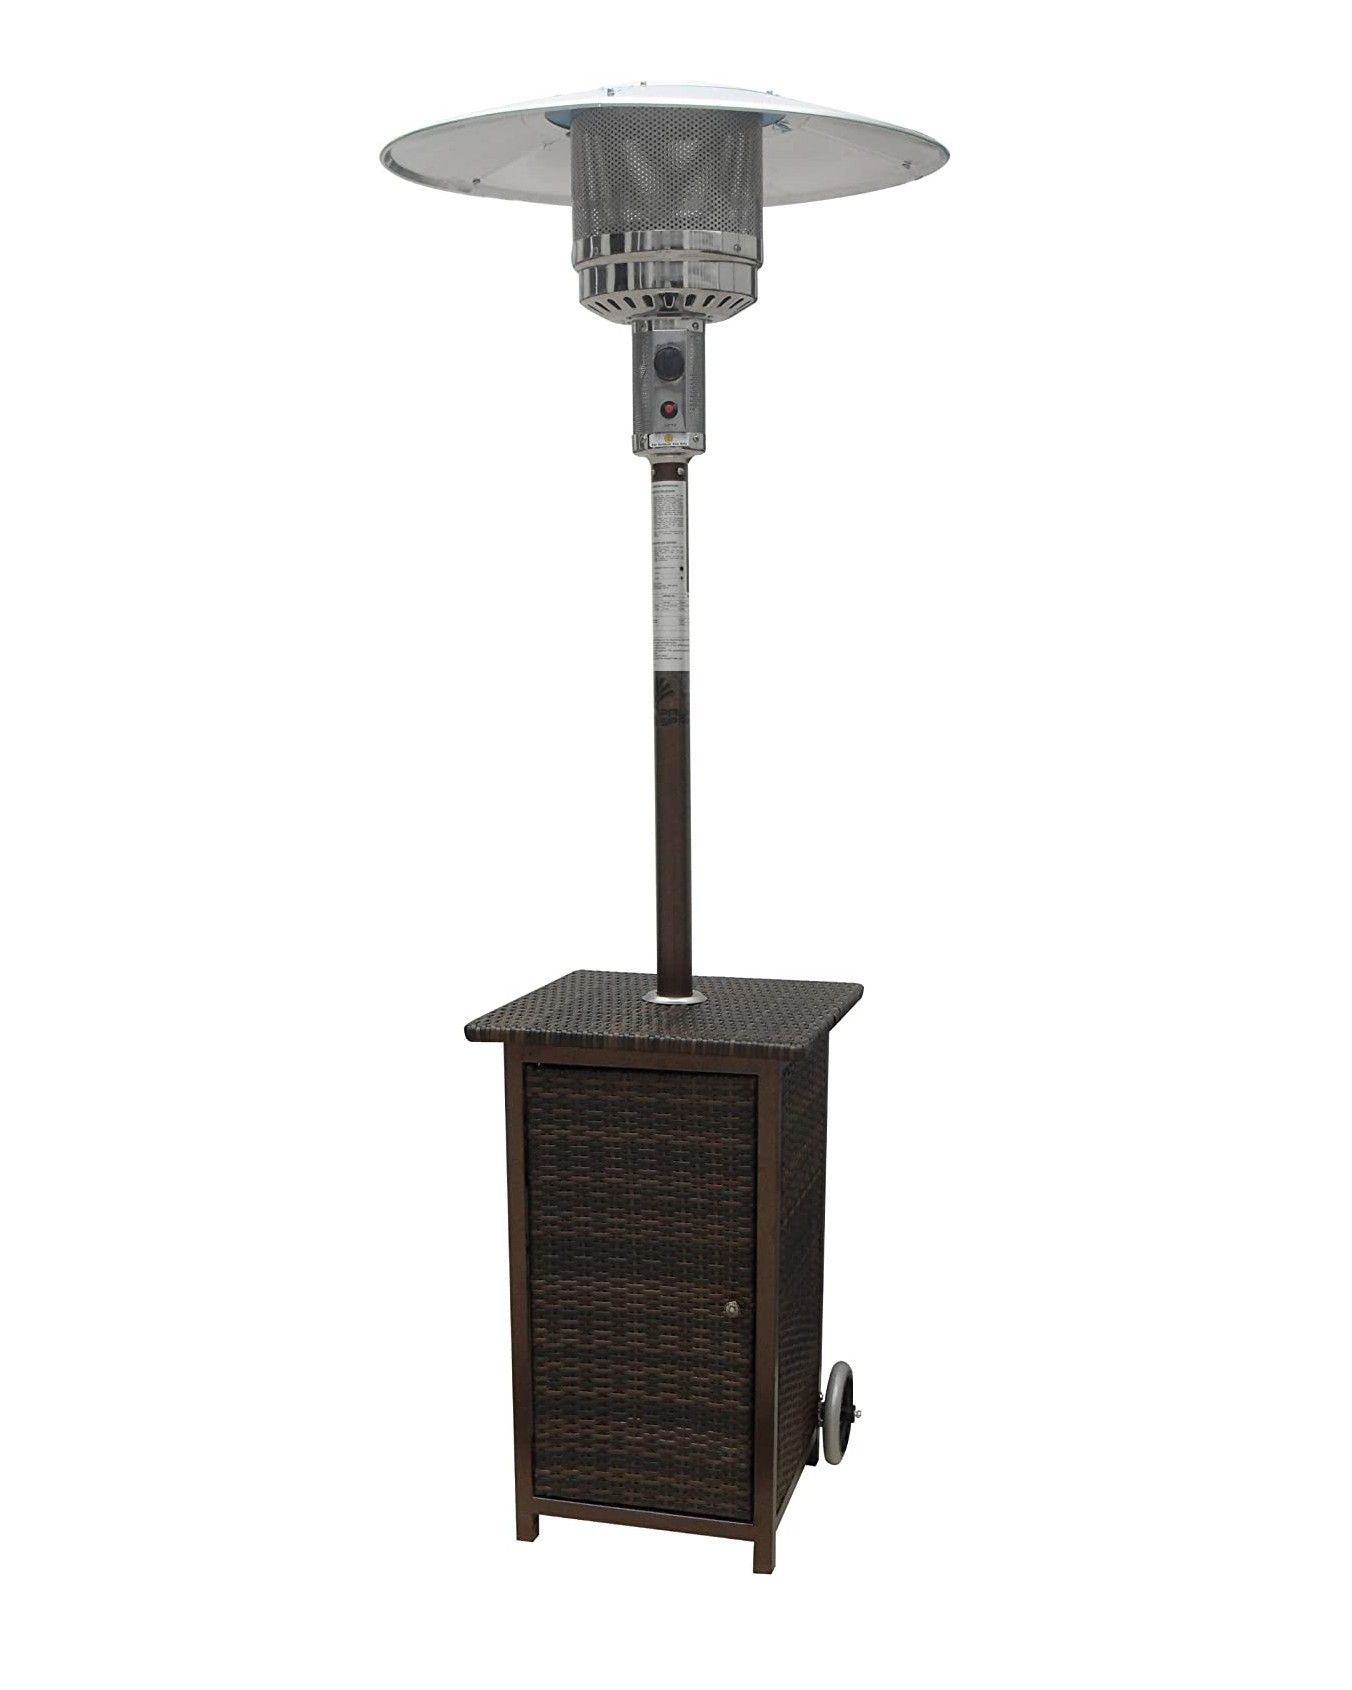 outdoor heater | Patio heater, Outside